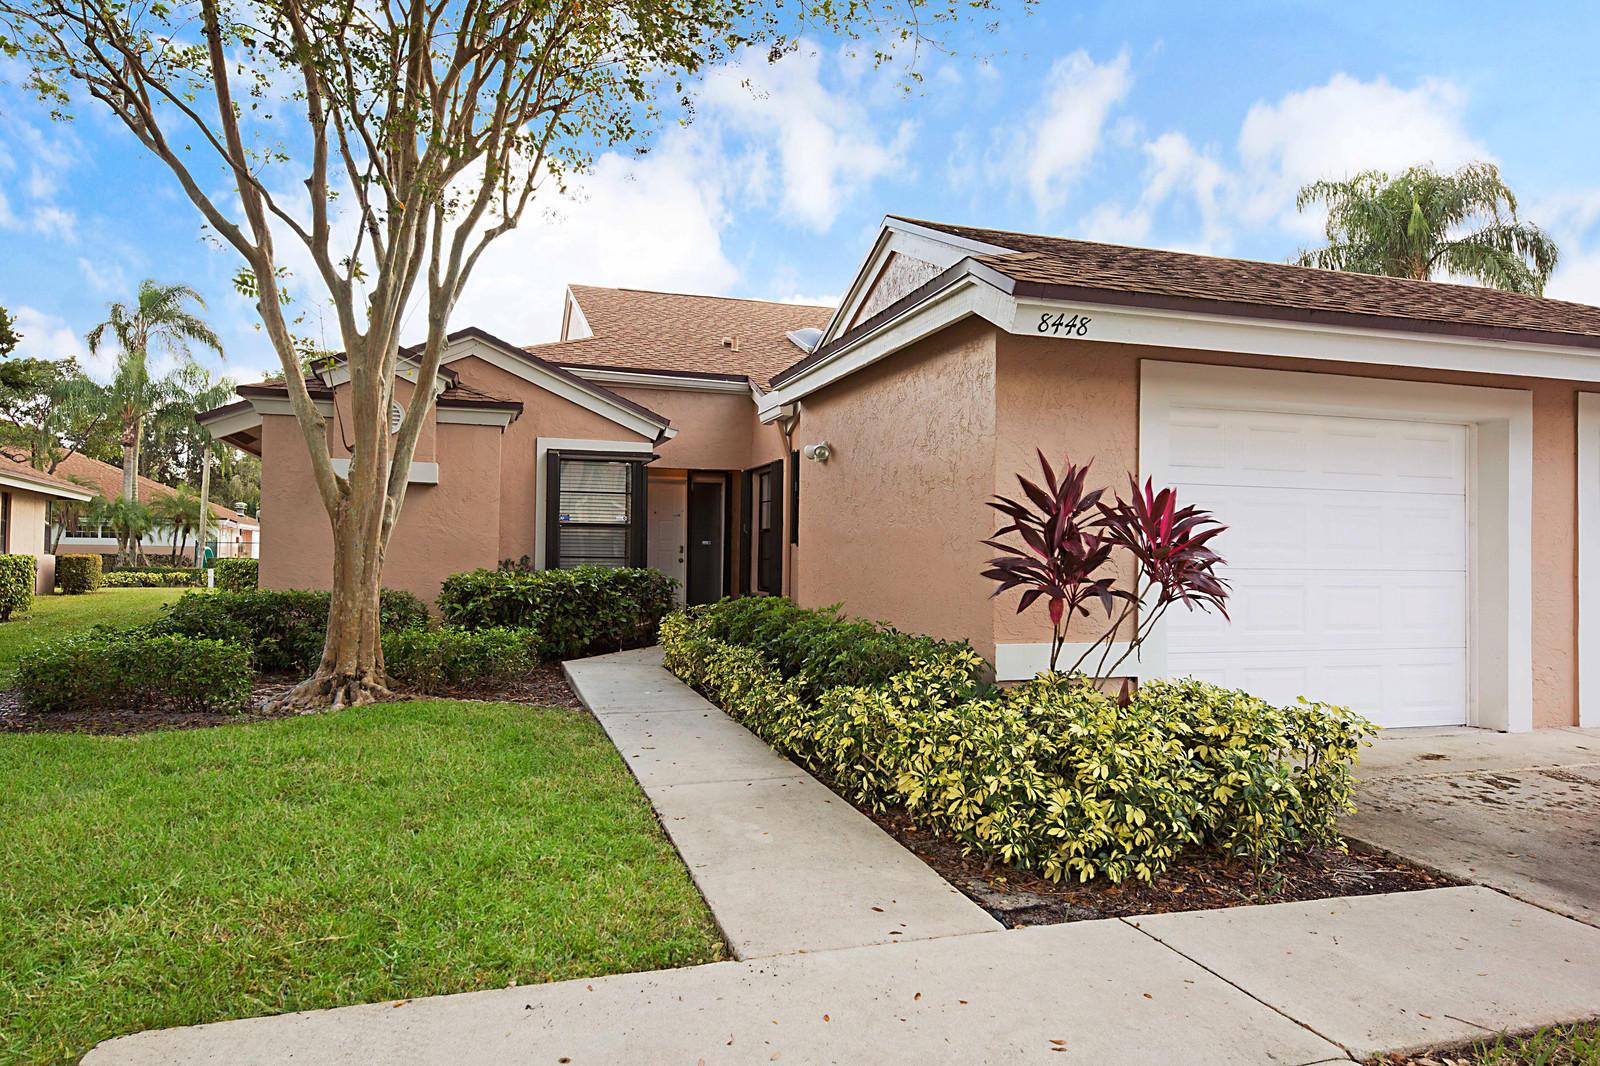 8448 Park Gate Road Boca Raton, FL 33496